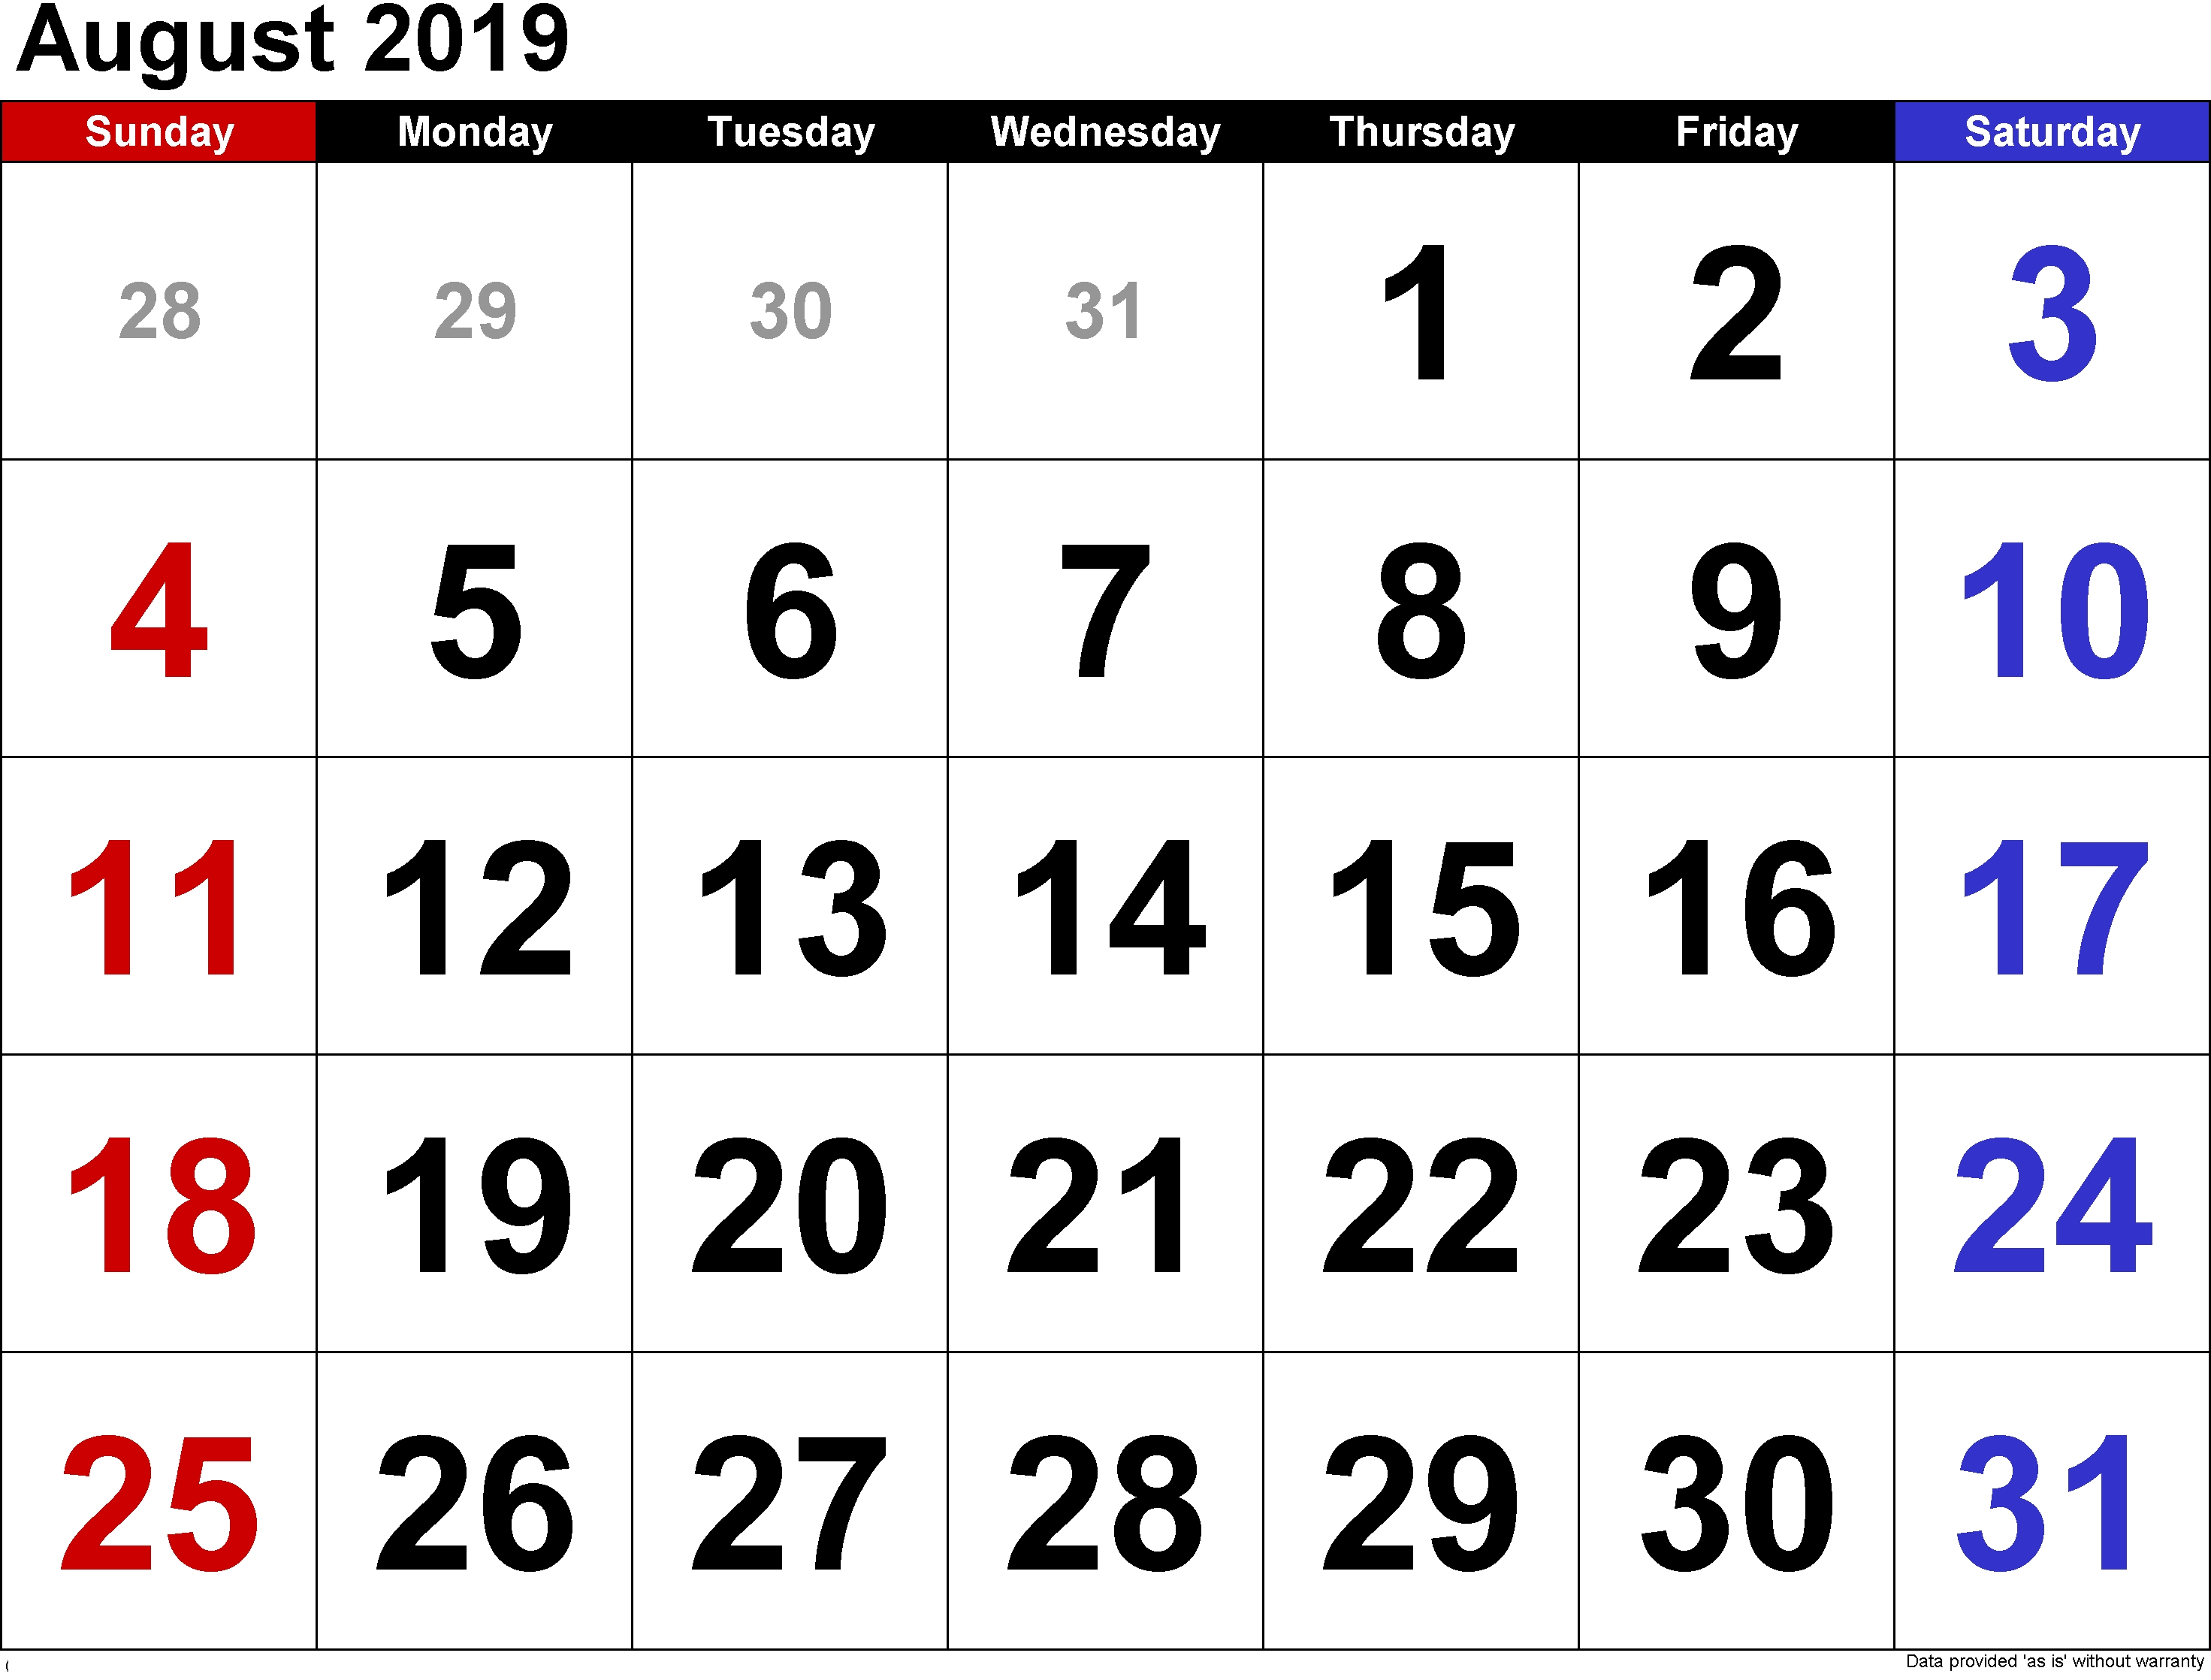 August 2019 Blank Holiday Calendar – Printable Calendar 2018 19 8 August 2019 Calendar